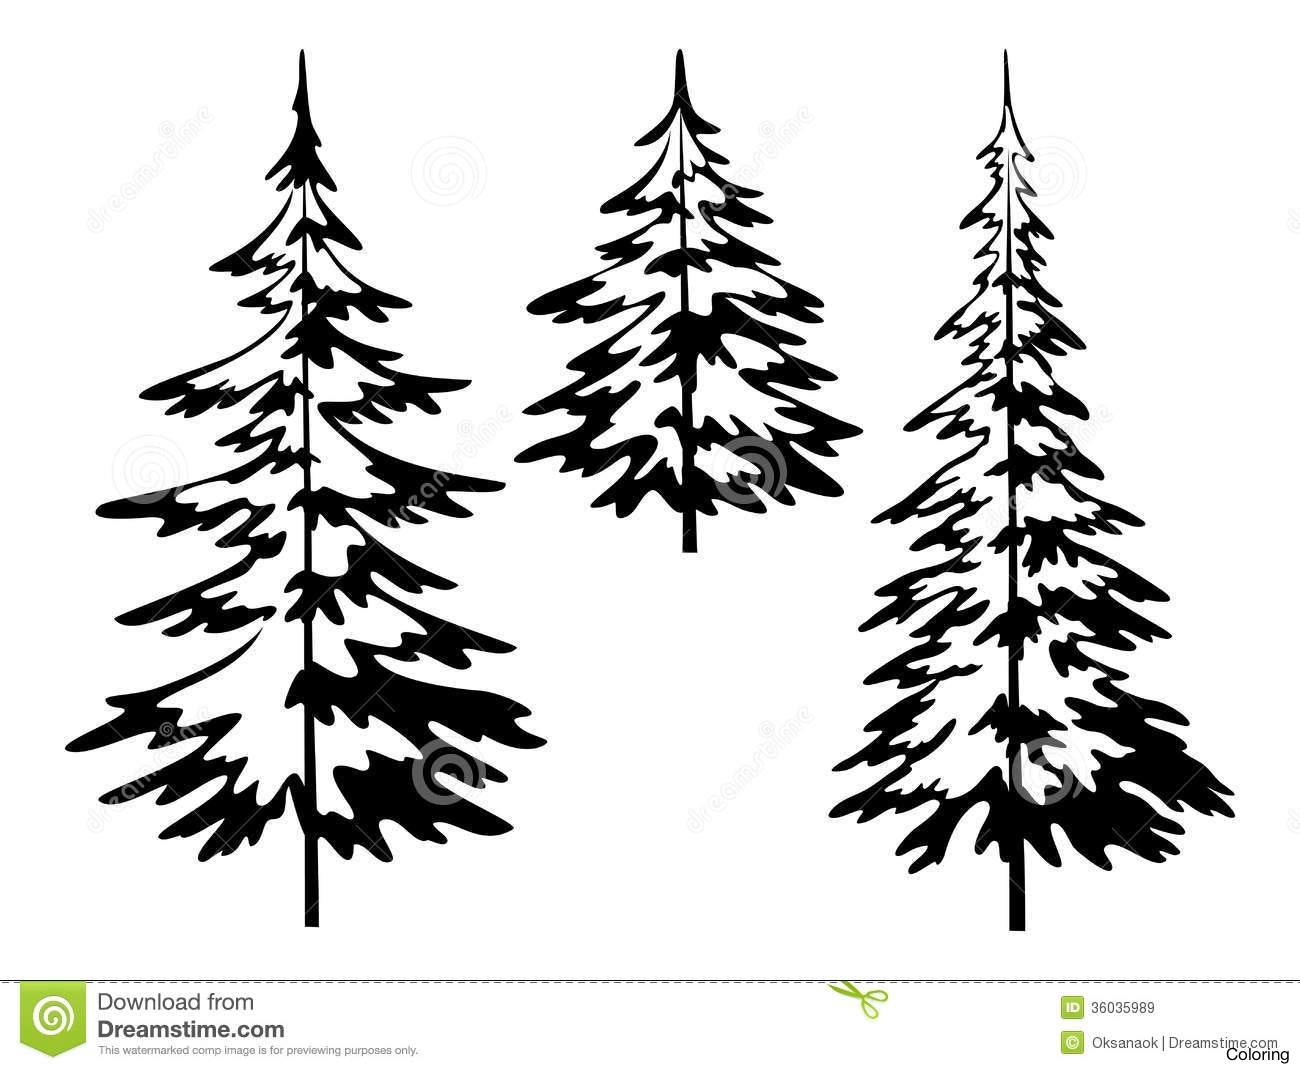 1300x1070 Hd Christmas Tree Drawing Pics Images Pine Drawings Coloring 23f